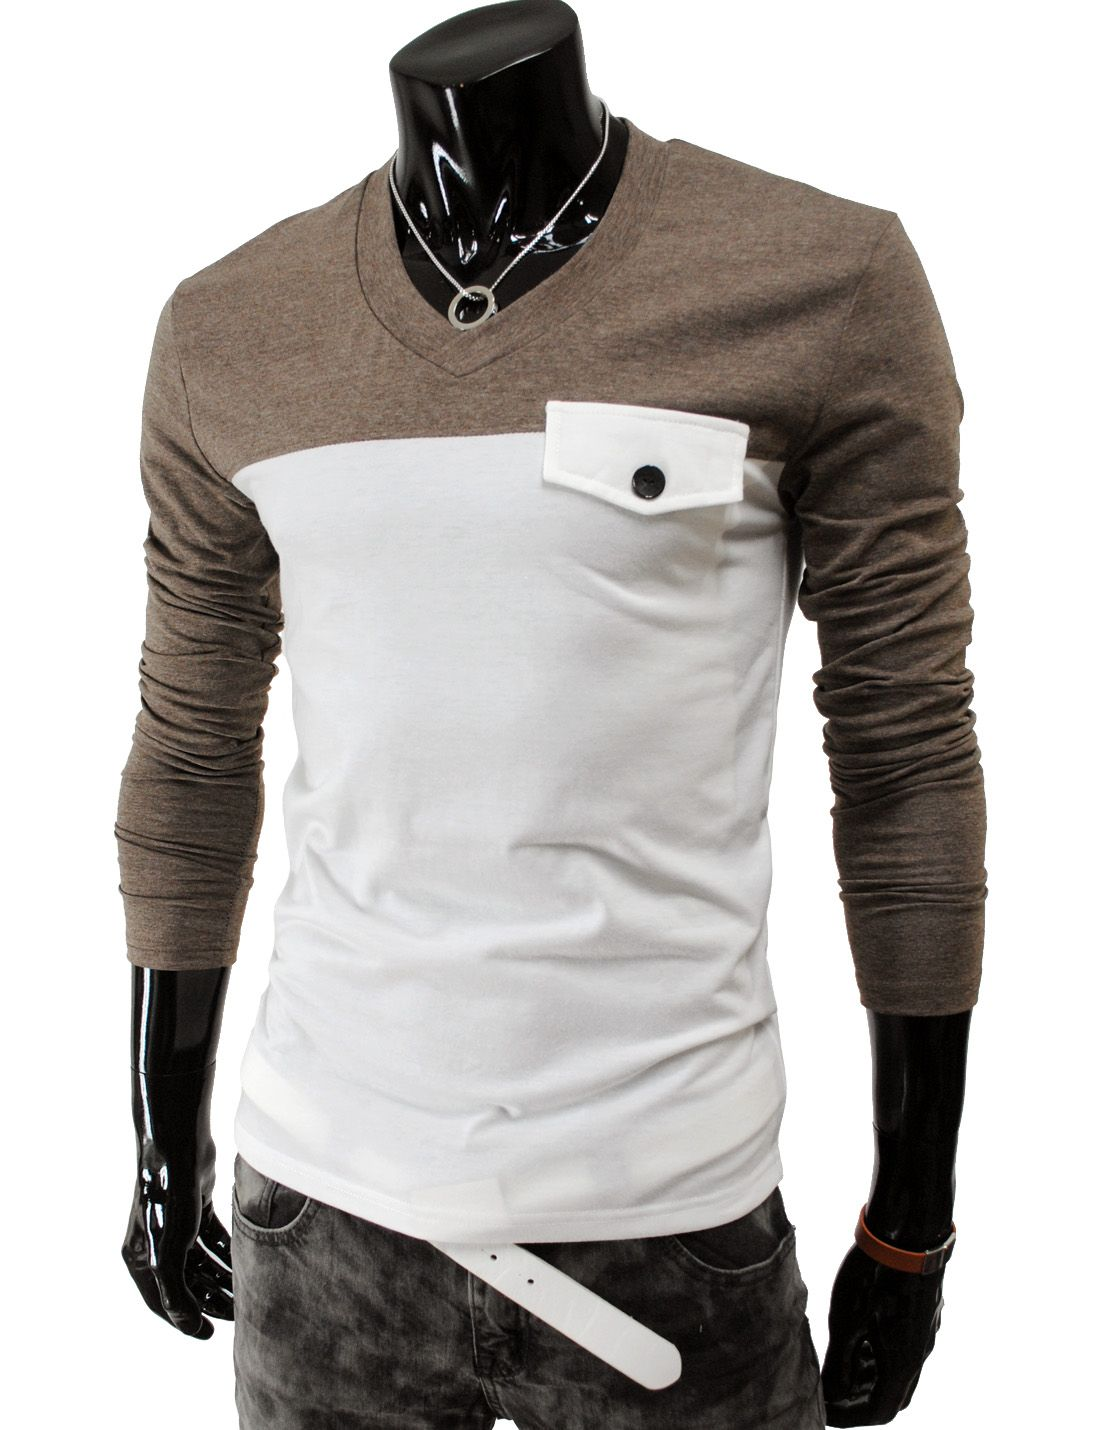 Slim fit 2 tone long sleeve t-shirt (DK19-brown) (Thelees Shop)